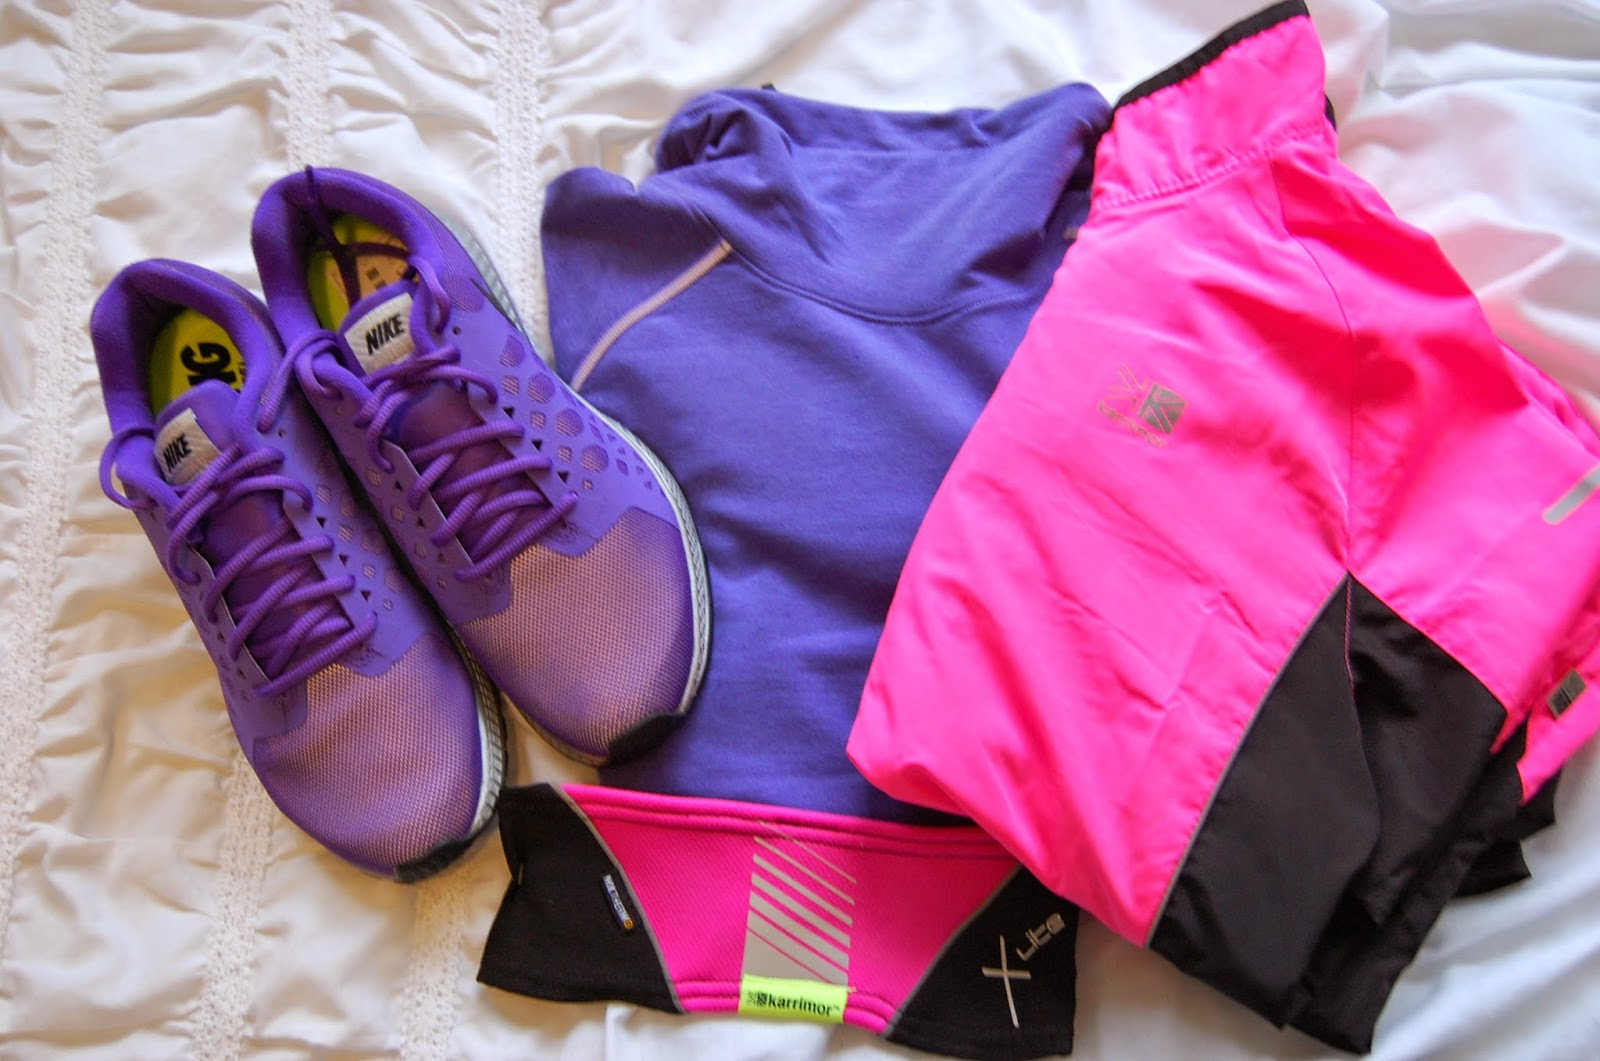 SportsShoes hi-viz running clothes